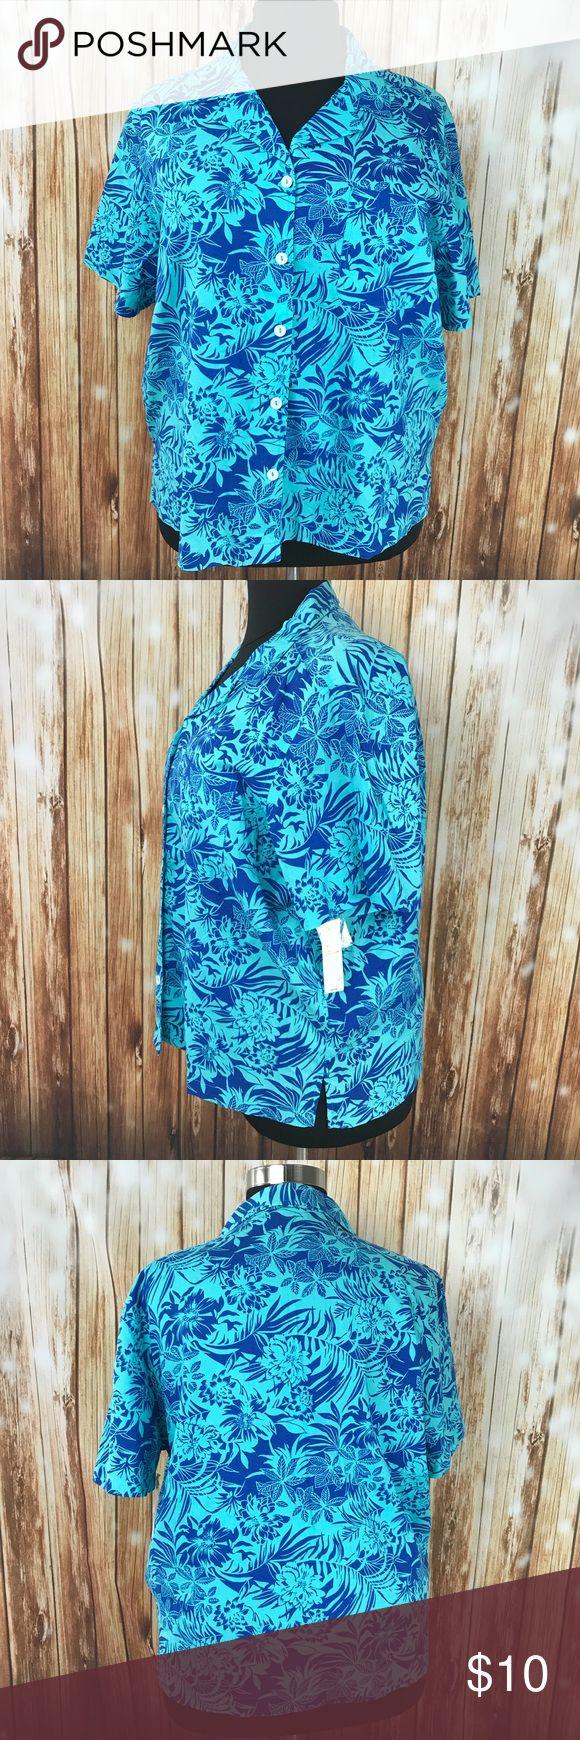 "2X Blue Hawaiian Shirt floral aqua palm tree New! New with tags shirt. Erika Woman size 2X. Blue Hawaiian shirt. Extra button included. Underarm to underarm 26"". Shoulder to hem 25"". 🏝Aloha! 🏝 Erika Tops Button Down Shirts"